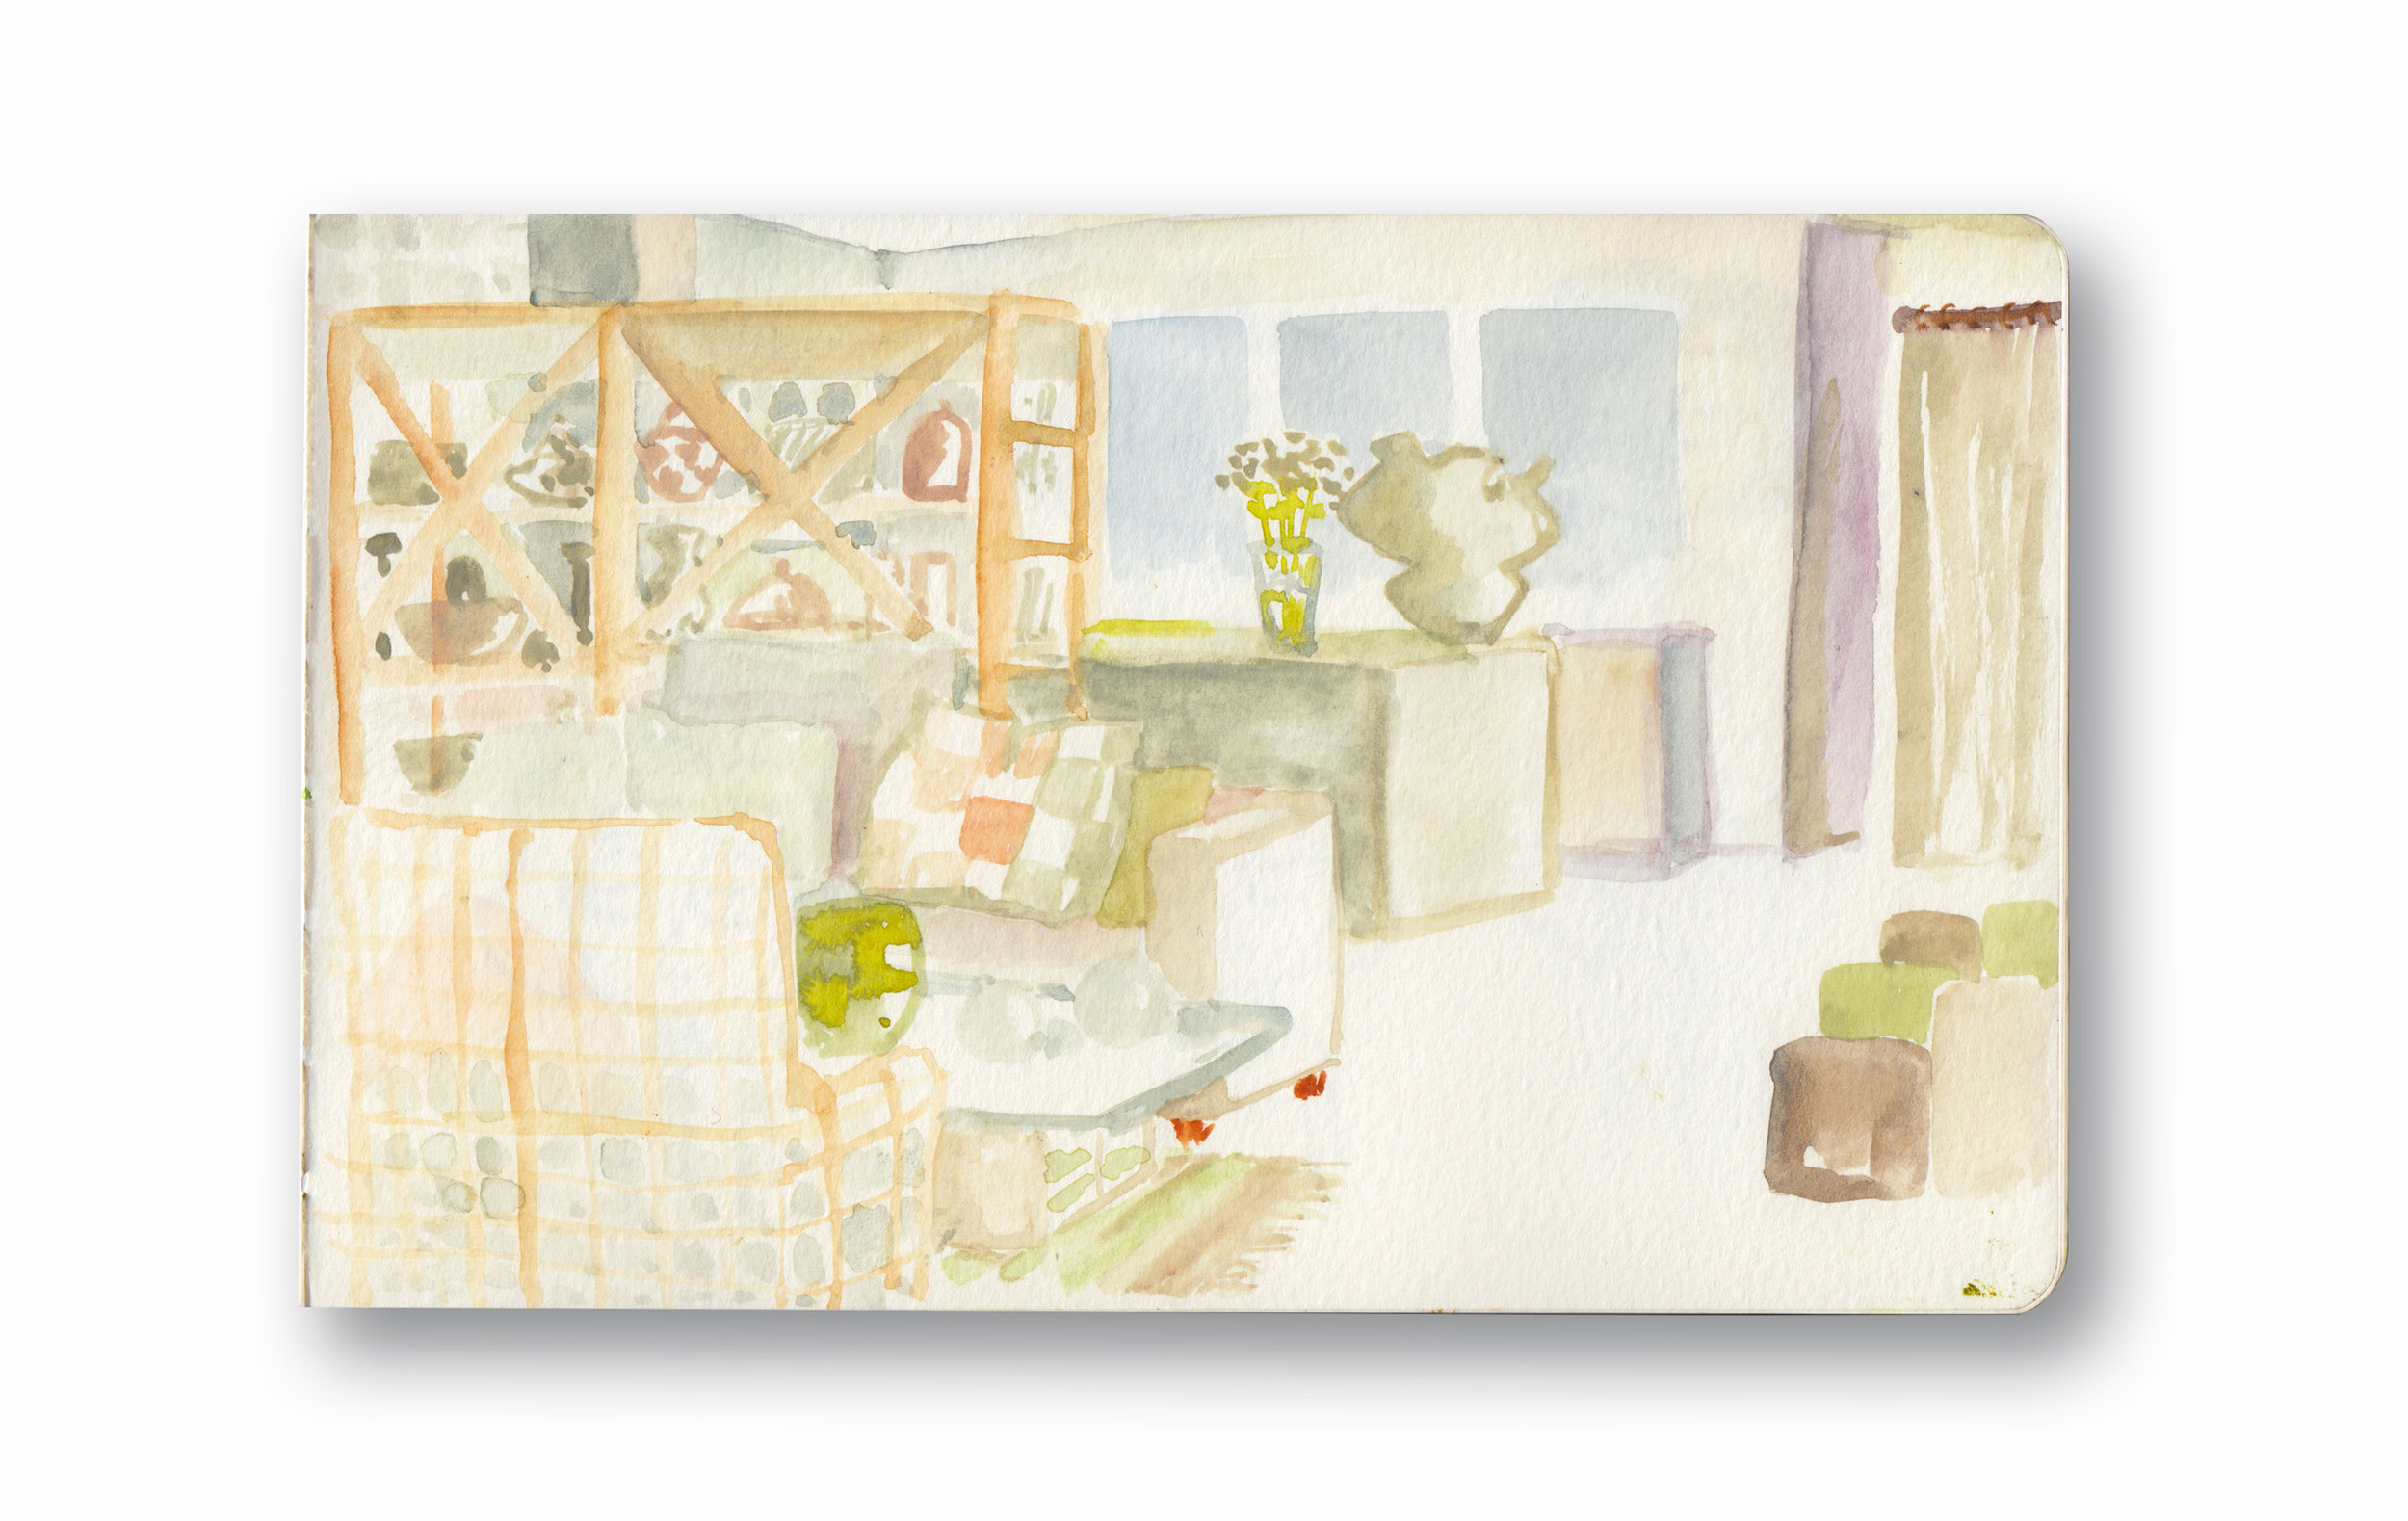 "The Downey's House - Durban, Sa  Watercolor & Gouache - MOleskine Sketchbook 5 x 8.25"""